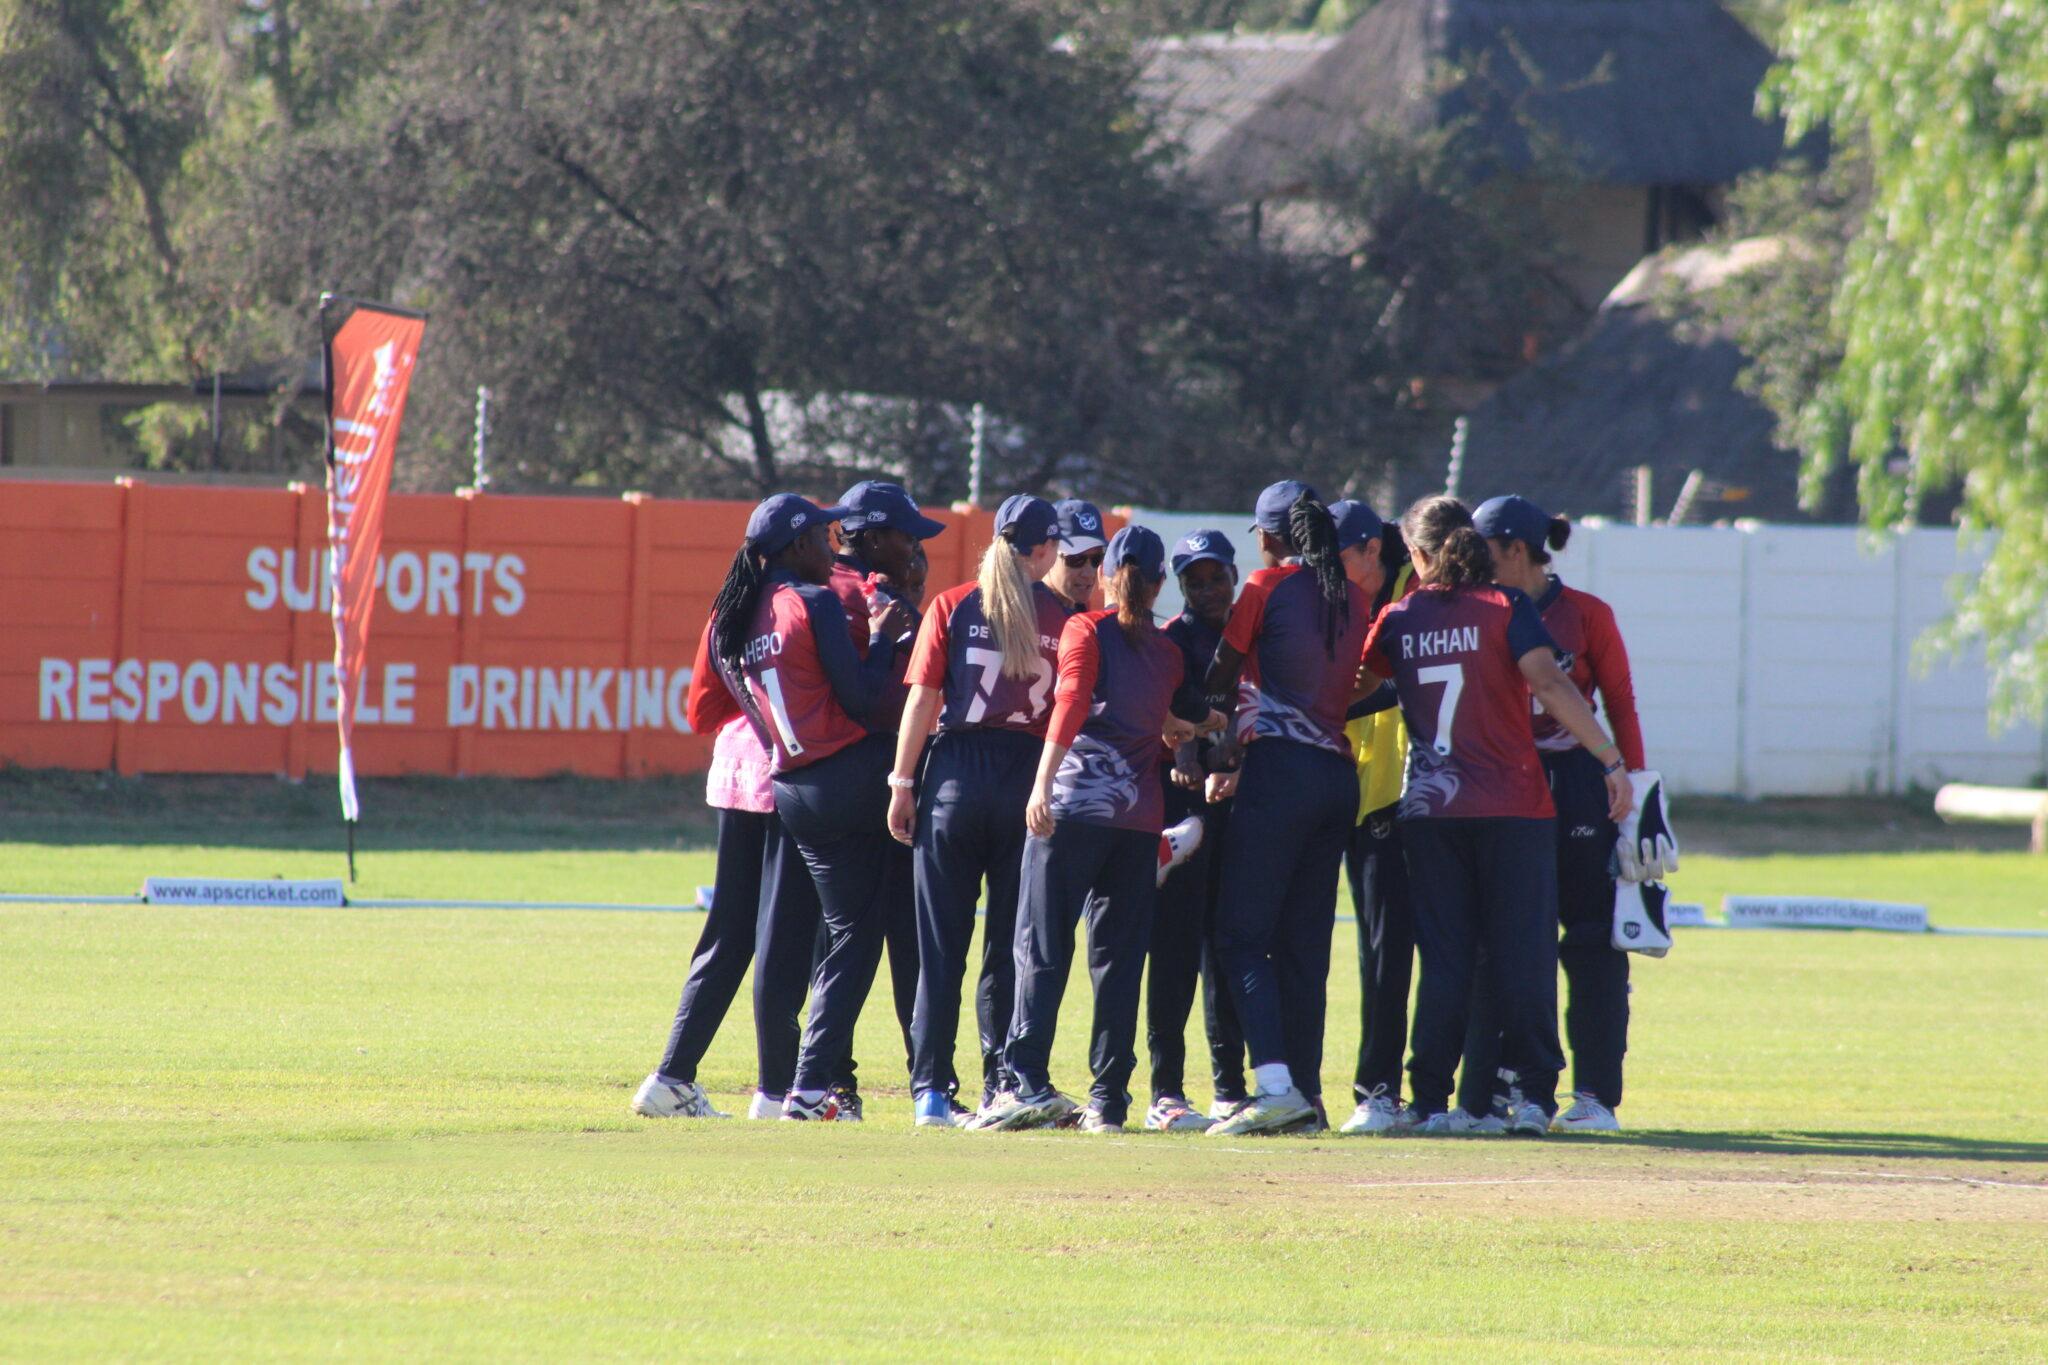 Cricket Namibia: National Women Cricket Team Compete in the Kwibuka Tournament in Rwanda